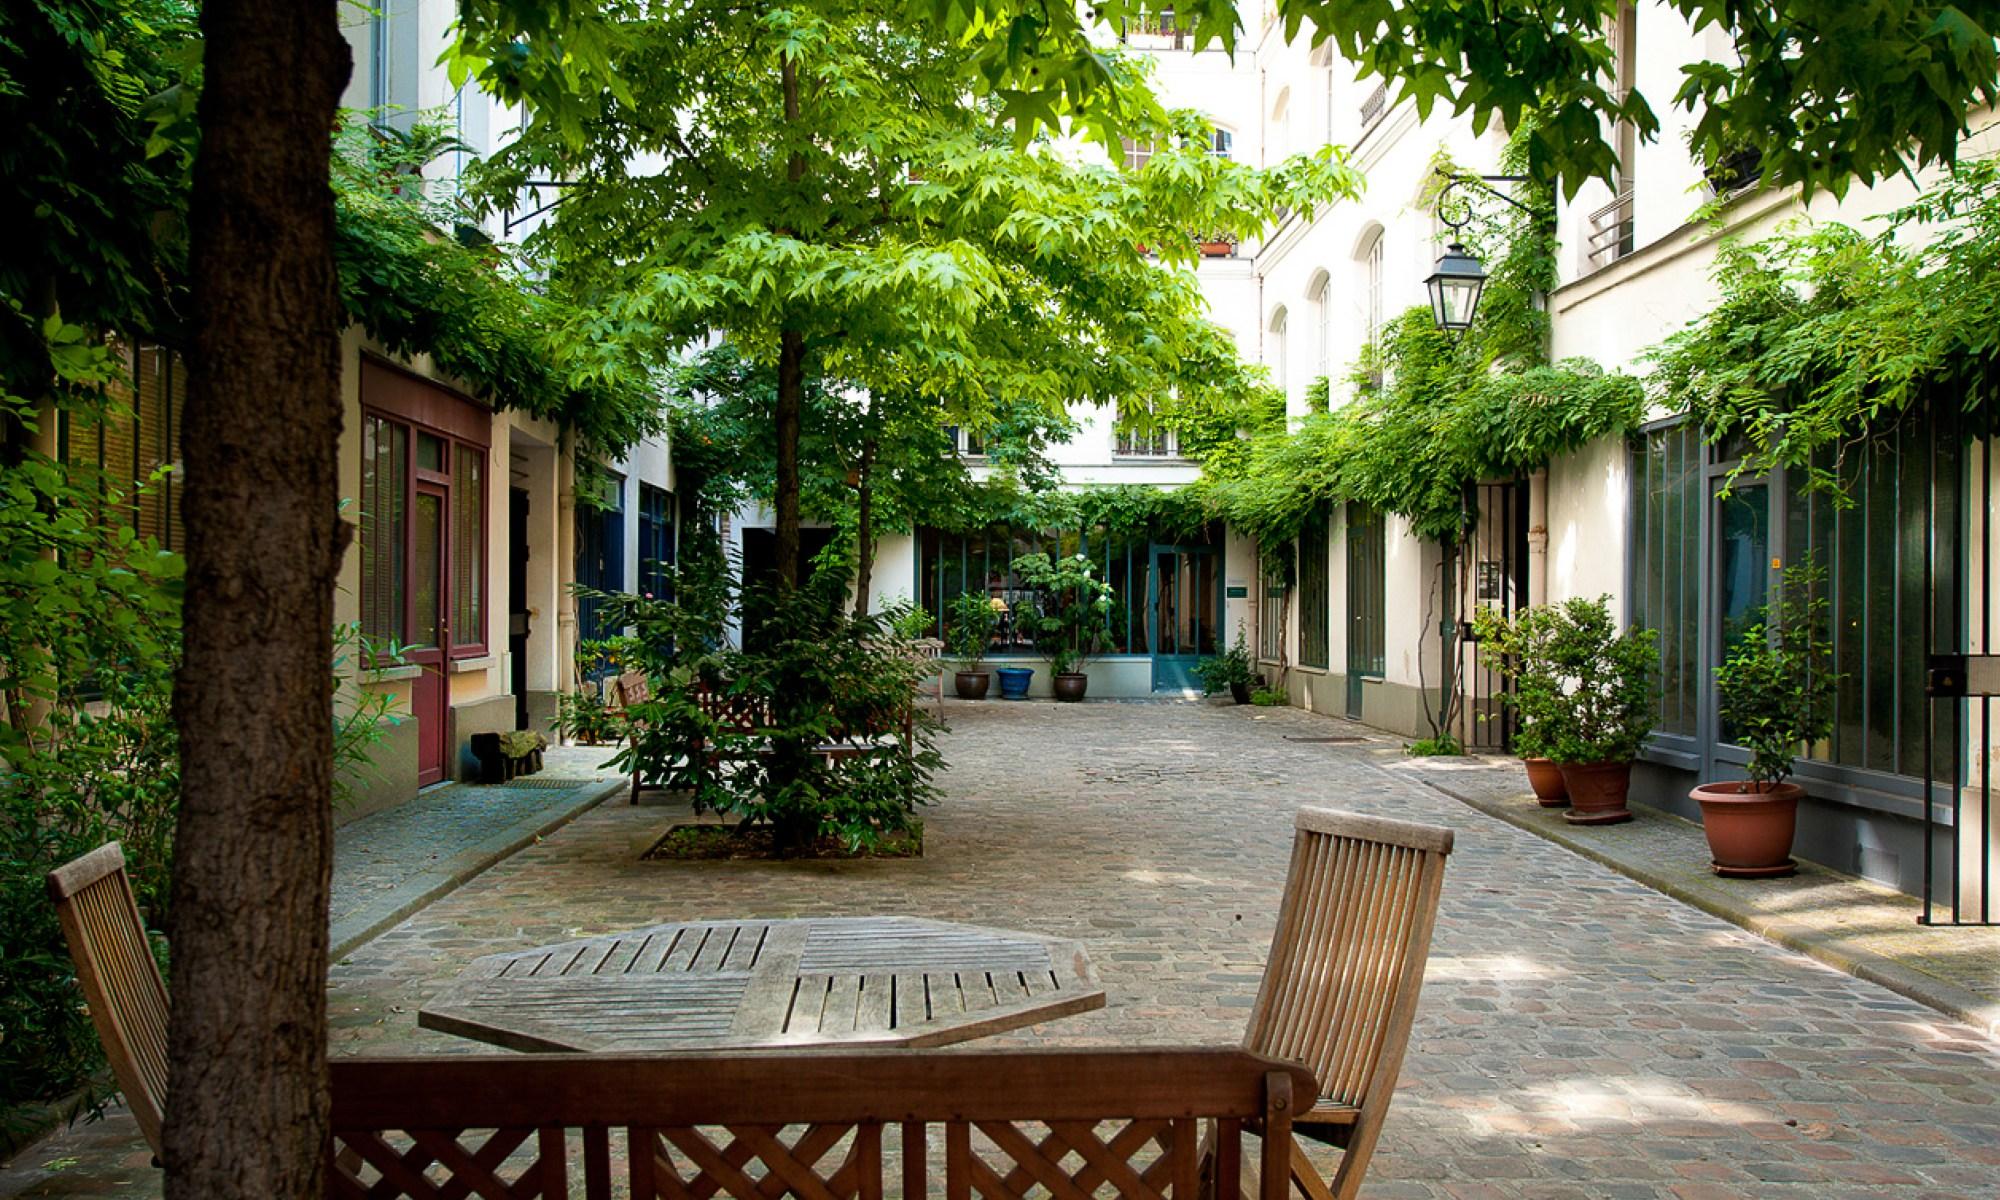 Atorg - 71 Rue du Faubourg Saint-Antoine 75011 Paris